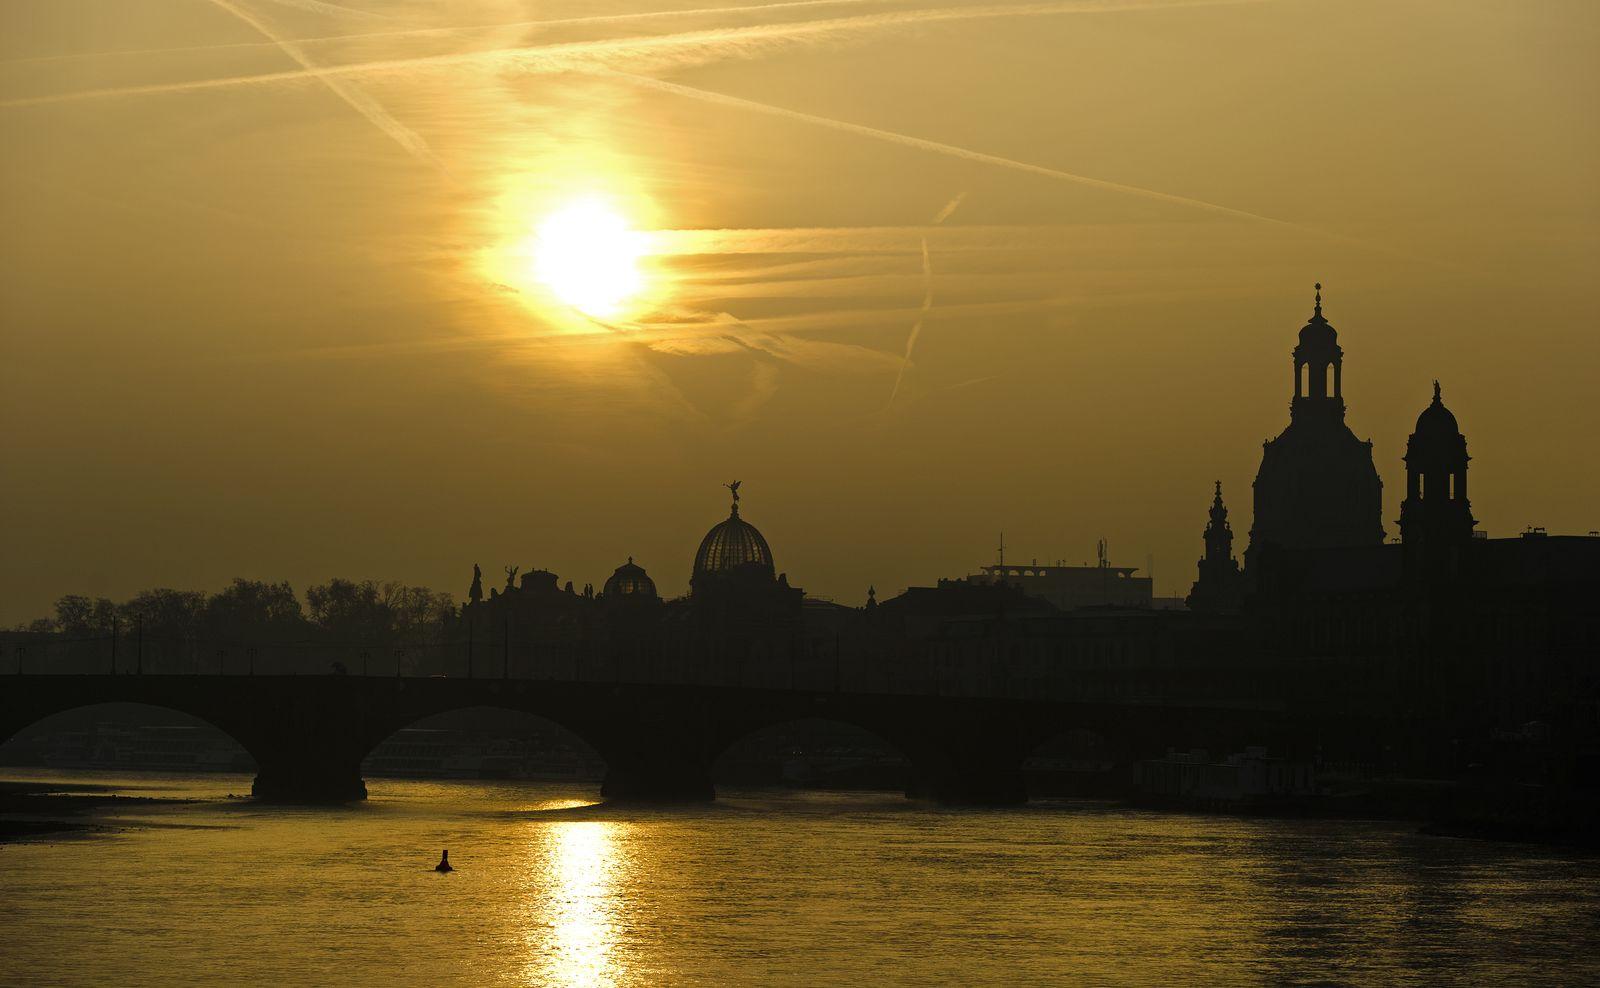 Sonnenaufgang / Klimawandel / Dresden